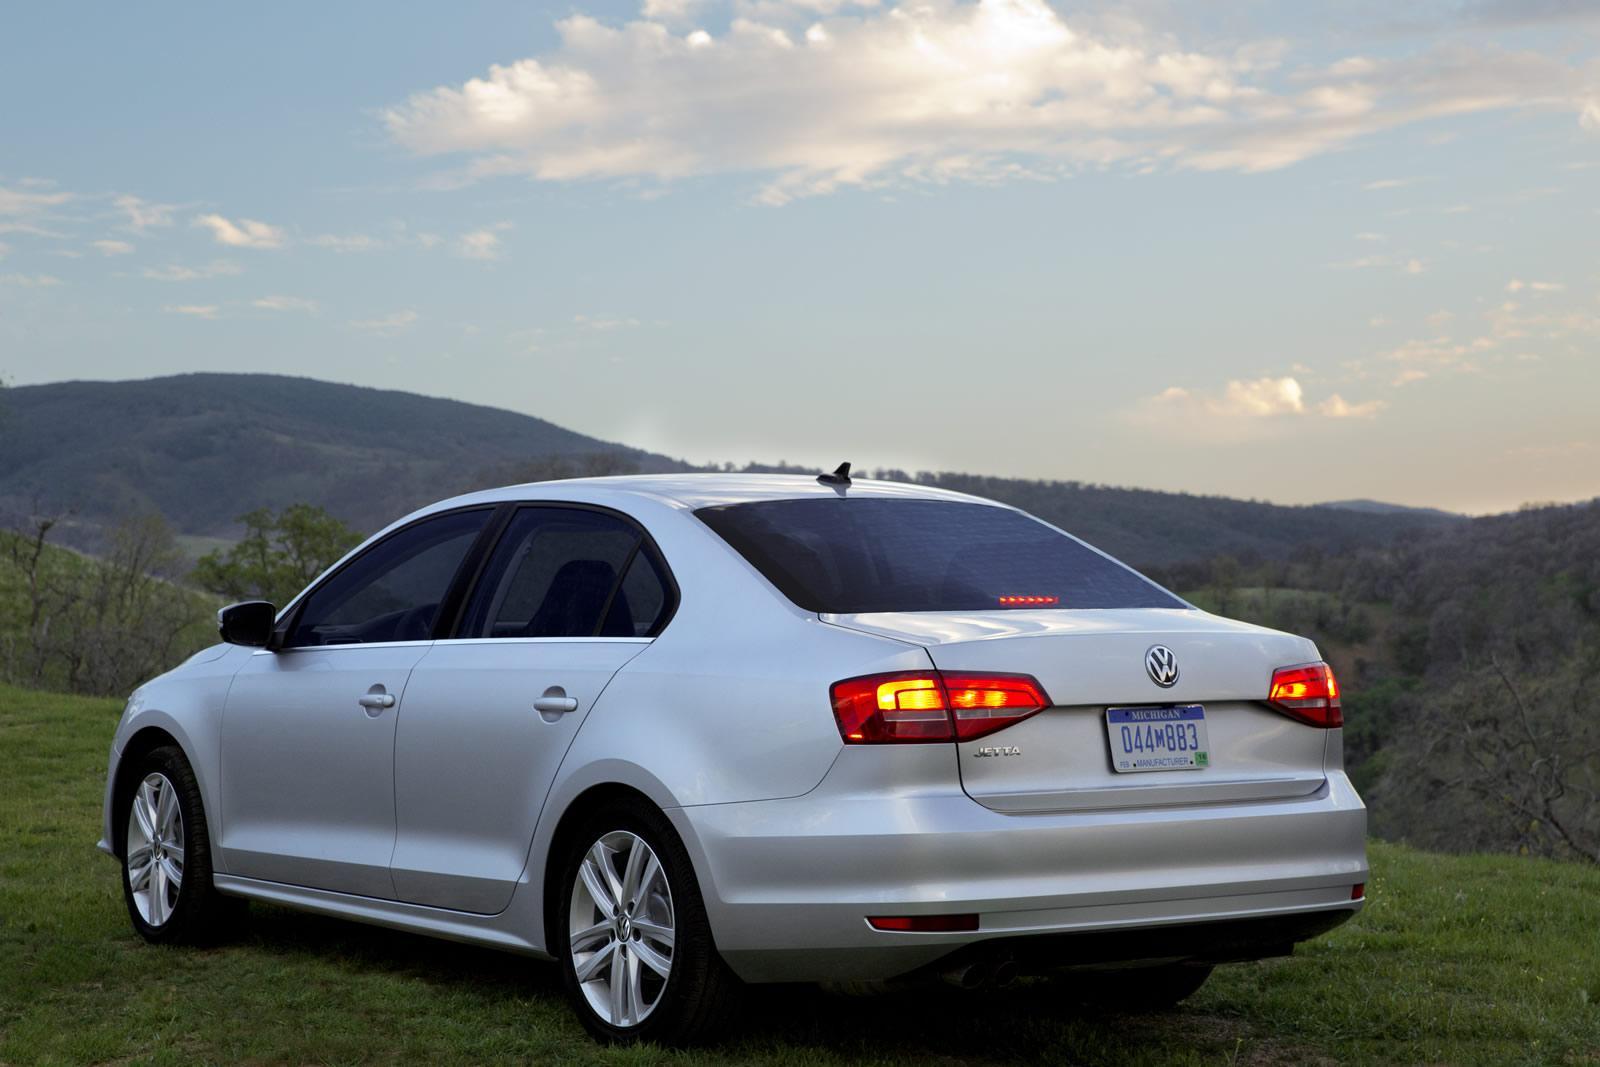 Volkswagen Announces 2015 Jetta US Pricing, Keeps 2.0L Entry-Level Engine - autoevolution